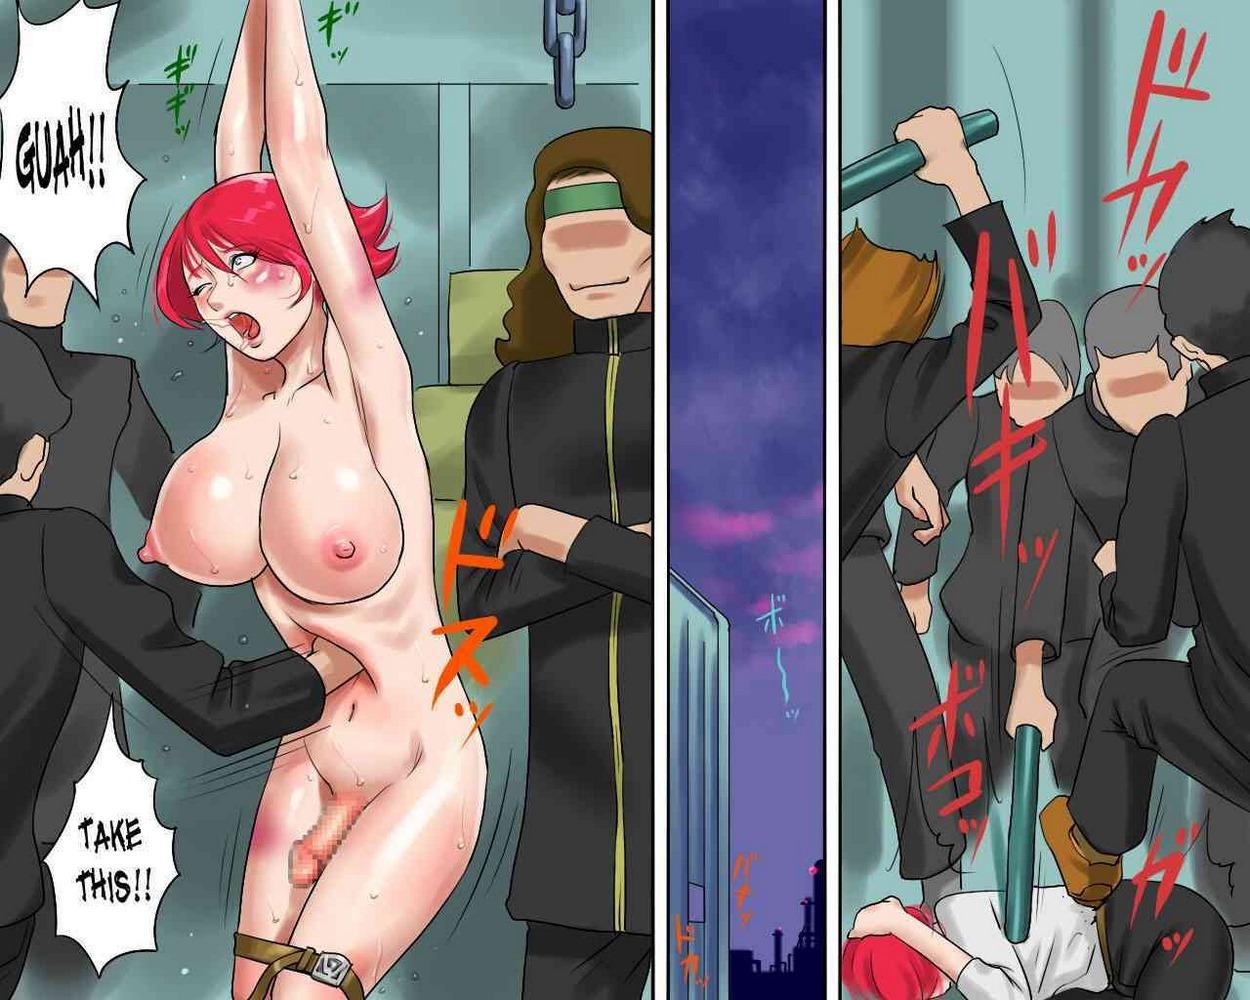 Porn Comics - Hentai-BSDM-Papermania porn comics 8 muses